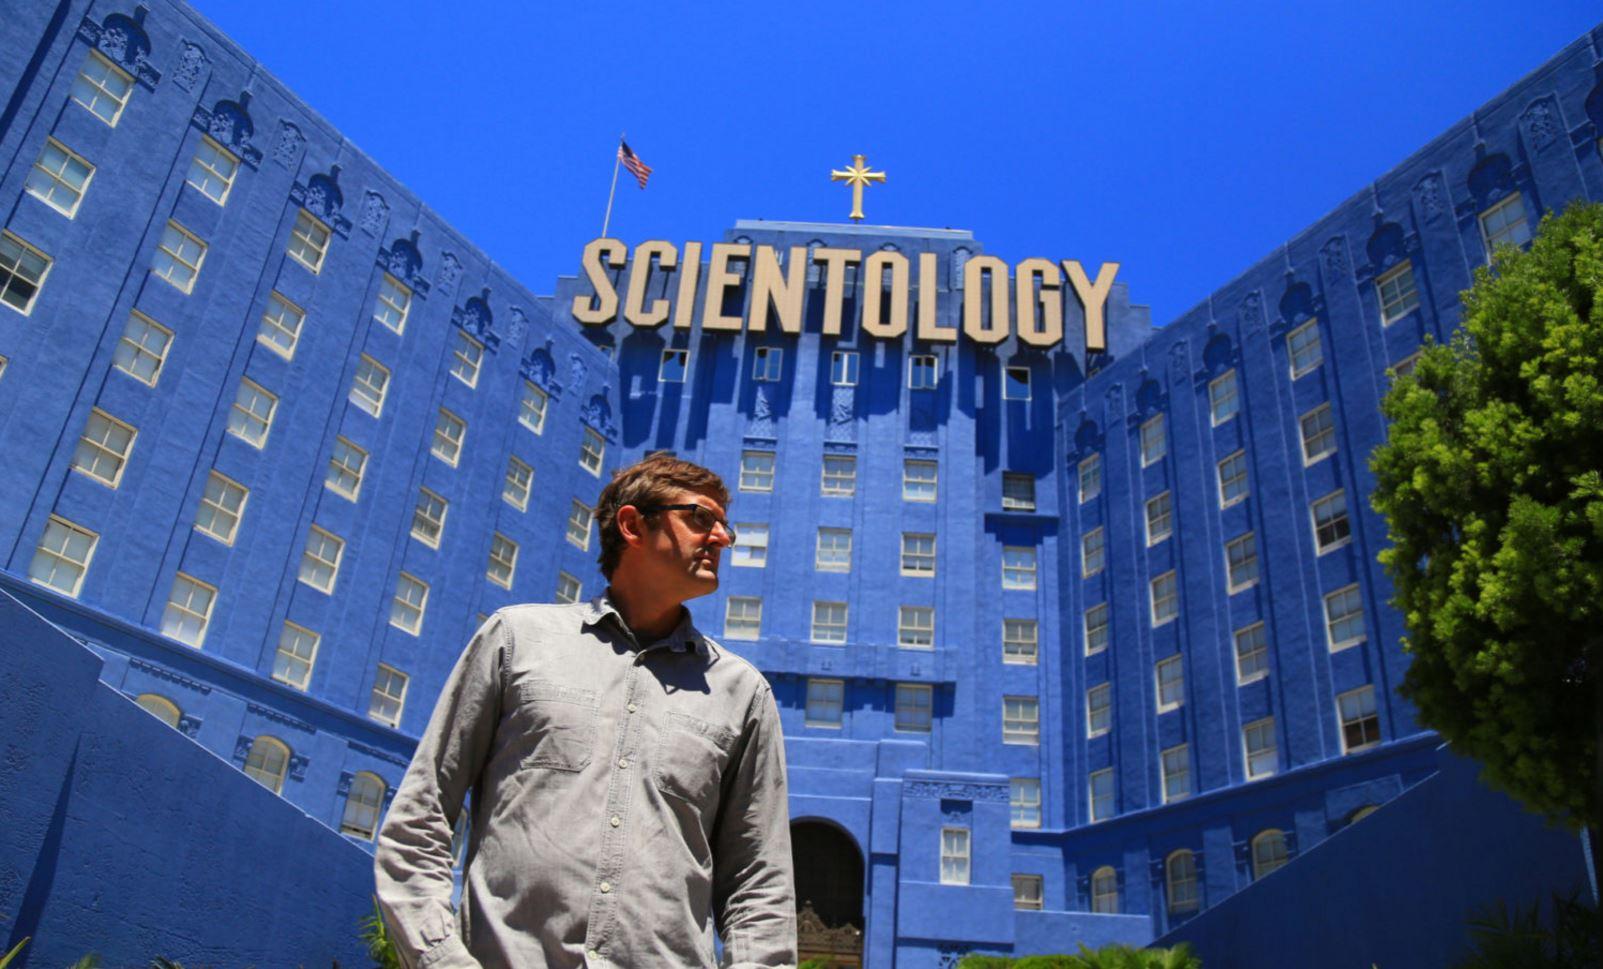 scientology 1.JPG